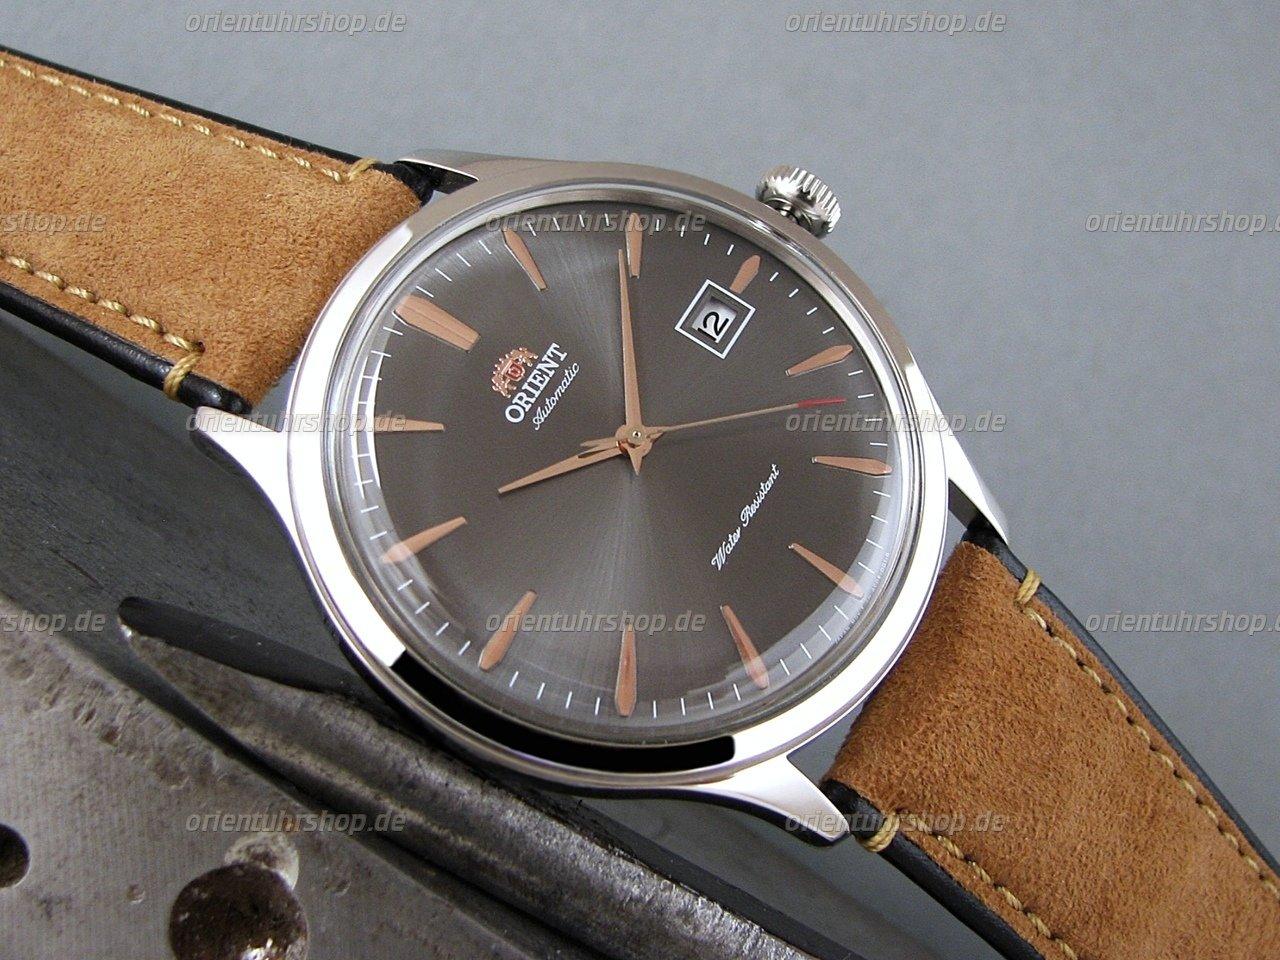 Orient Bambino Automatik Herrenuhr FAC08003A0